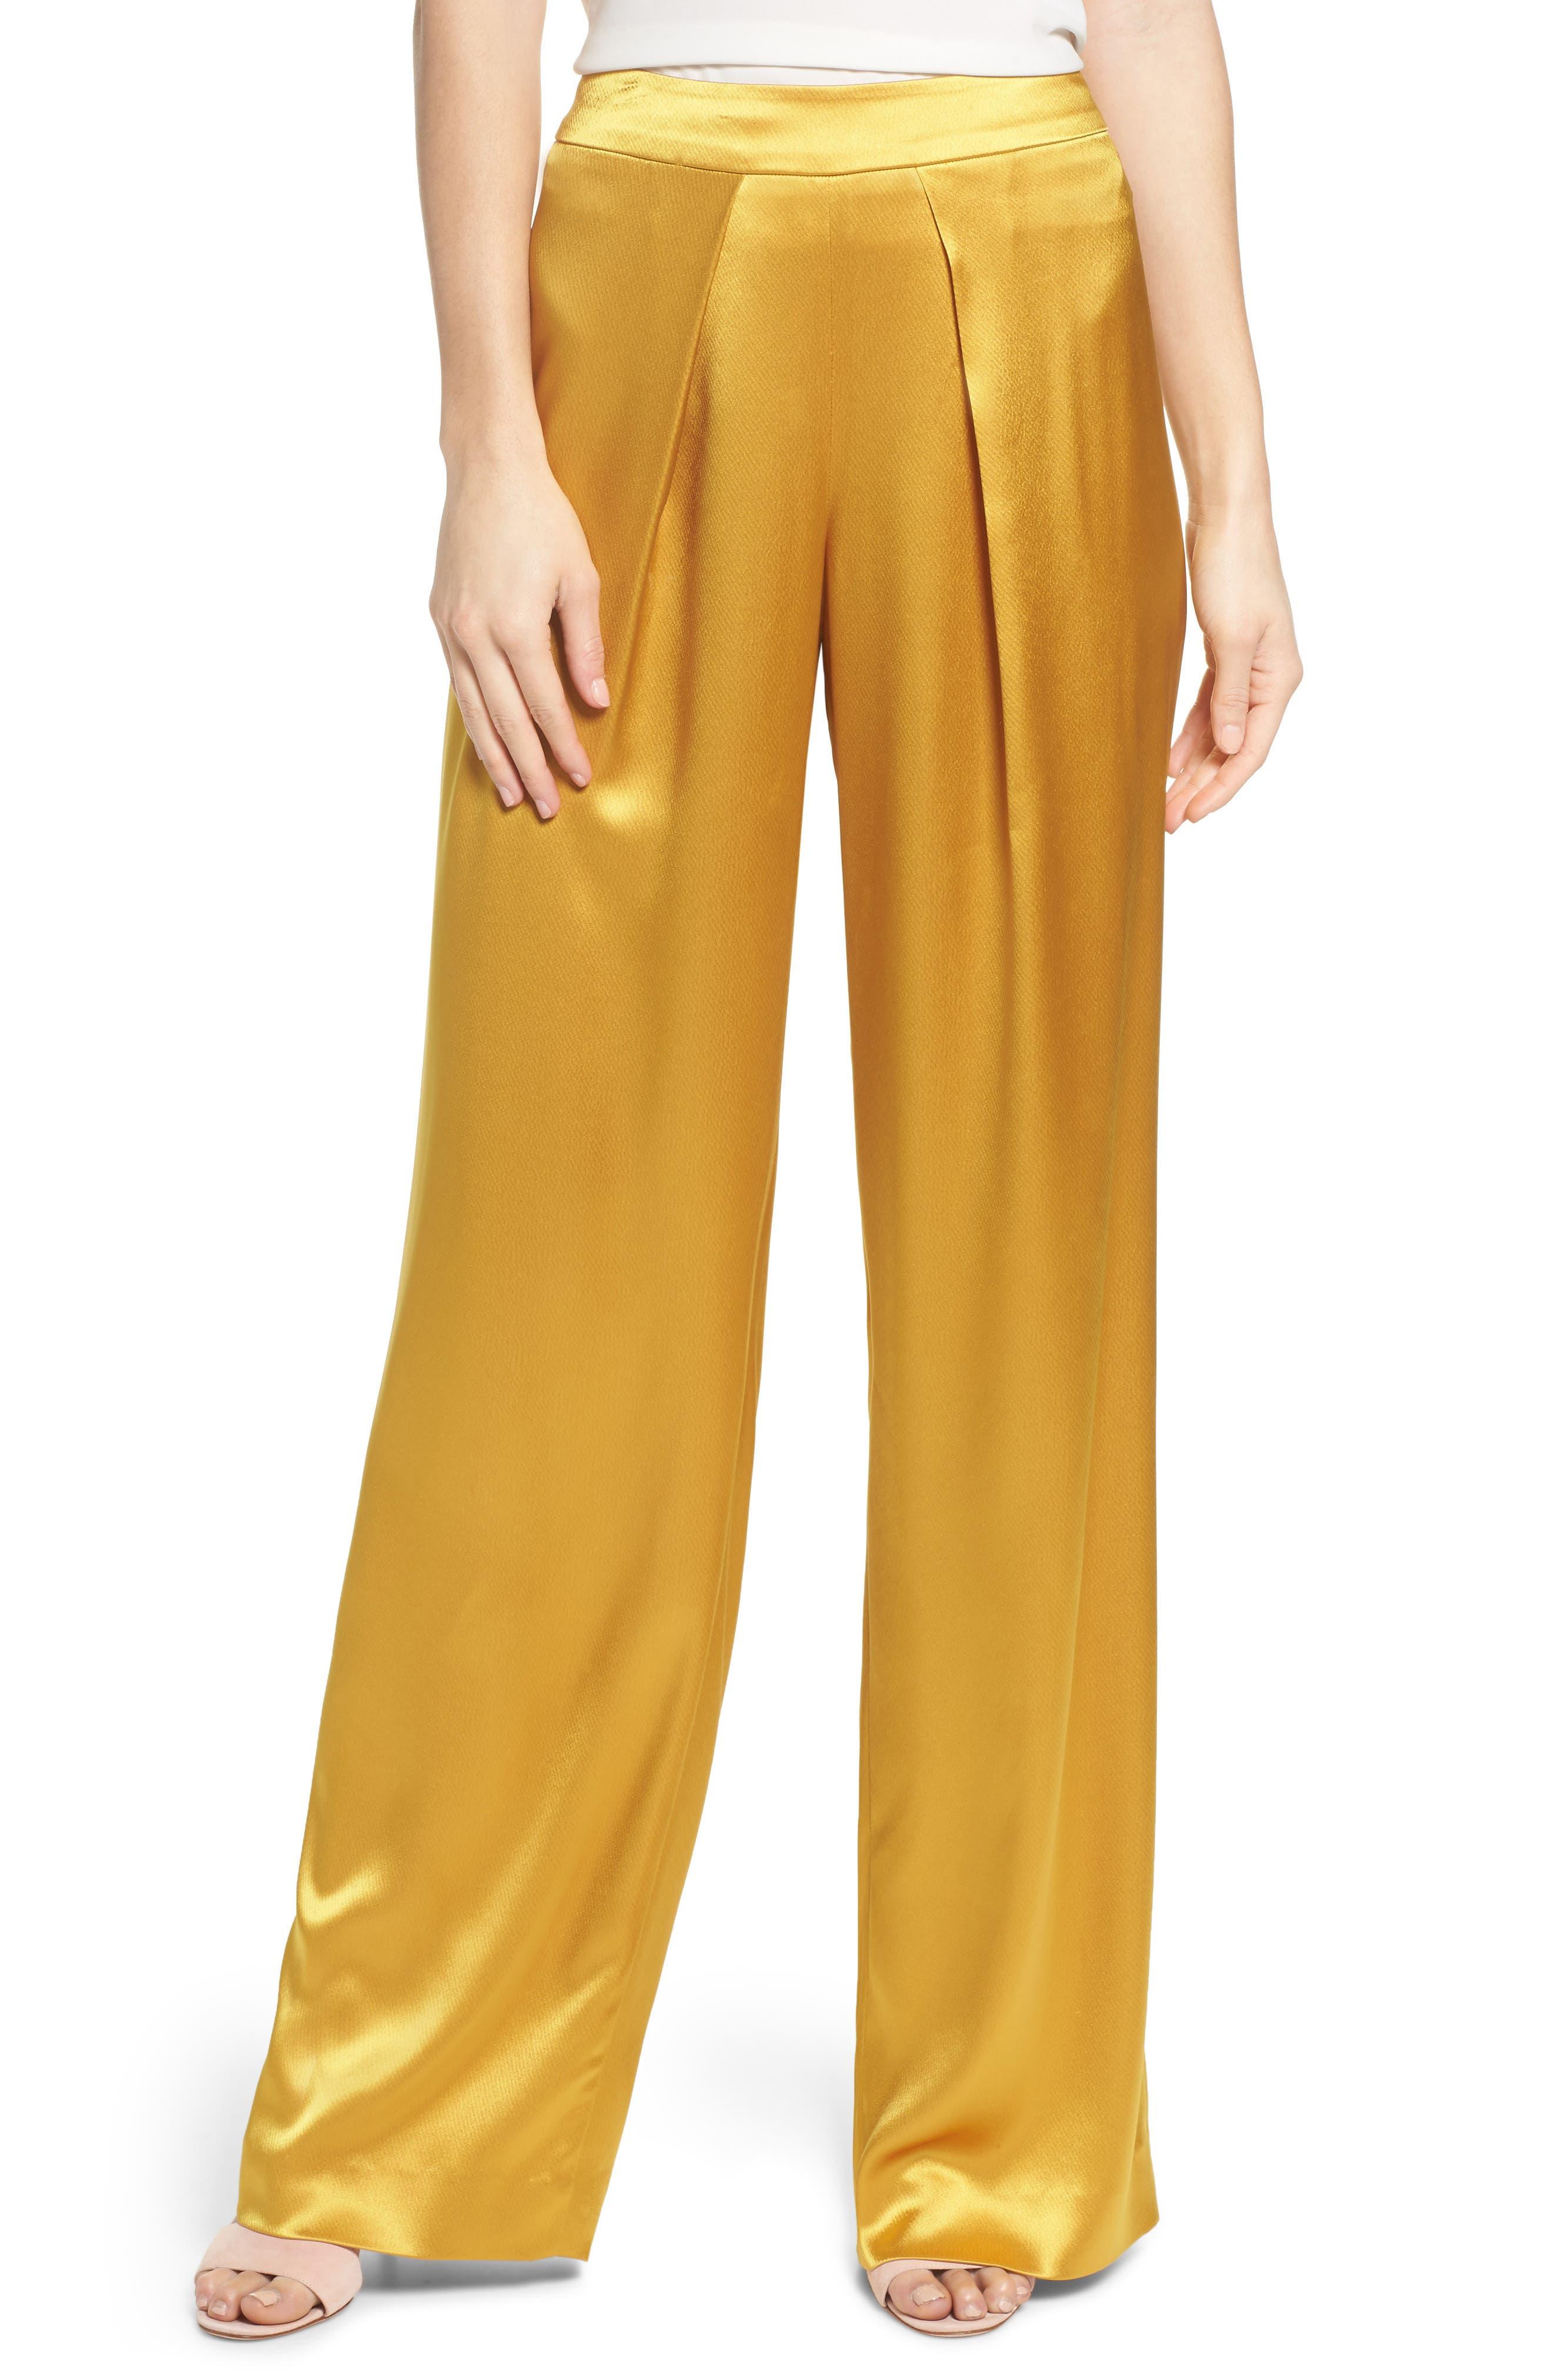 Fancy Pleated Front Satin Pants,                             Main thumbnail 1, color,                             700